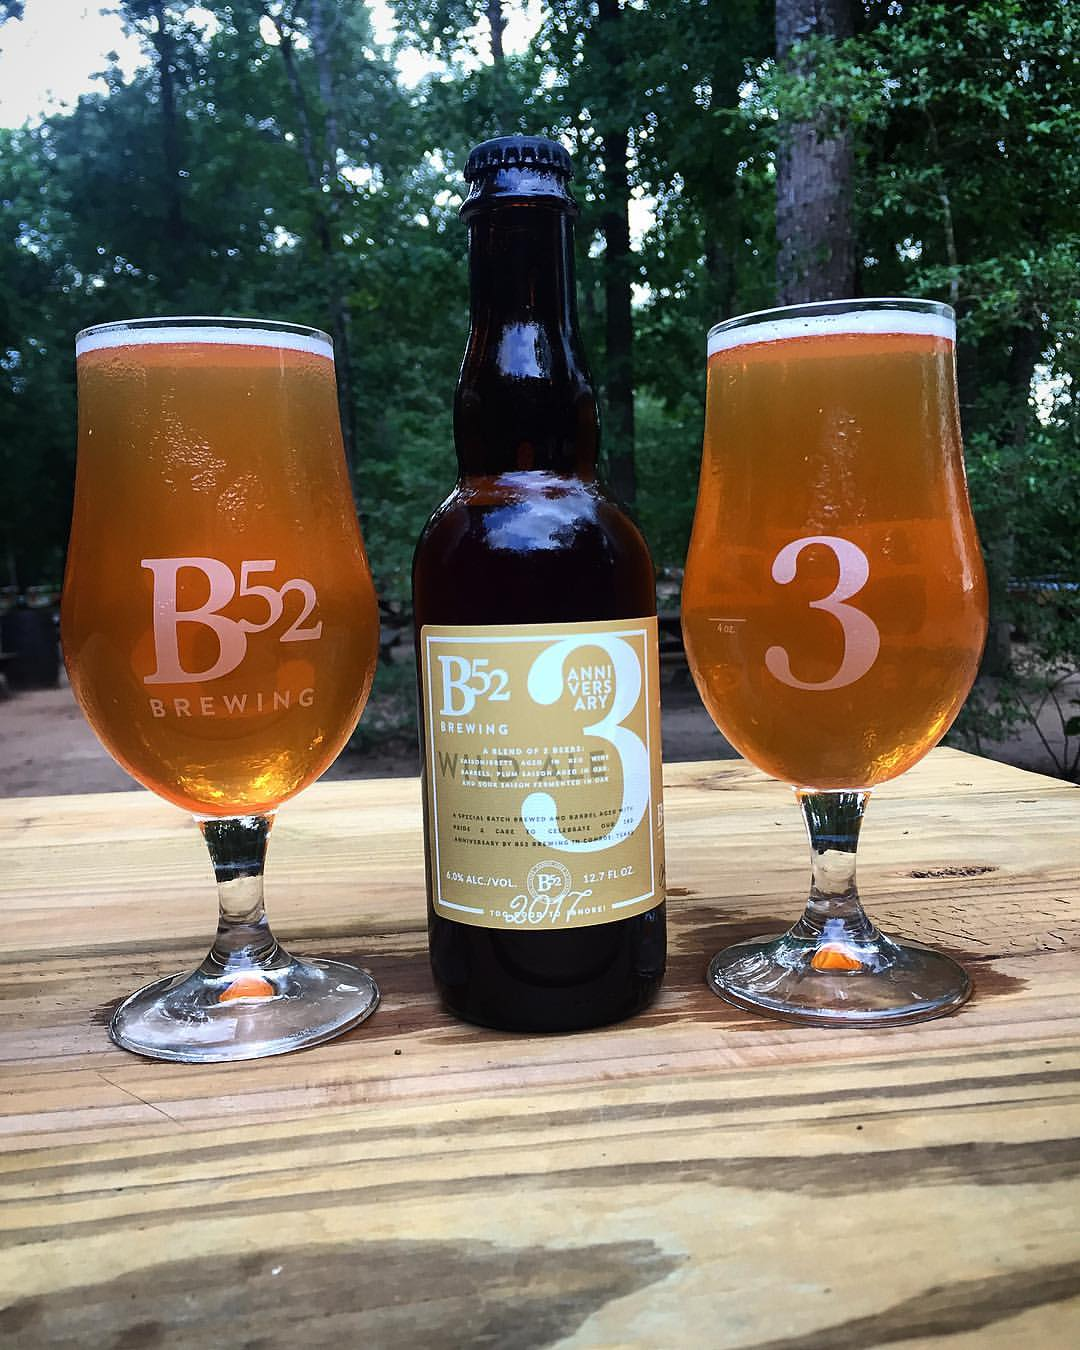 B52 Brewing | 3 Year Anniversary Blend Wild Ale